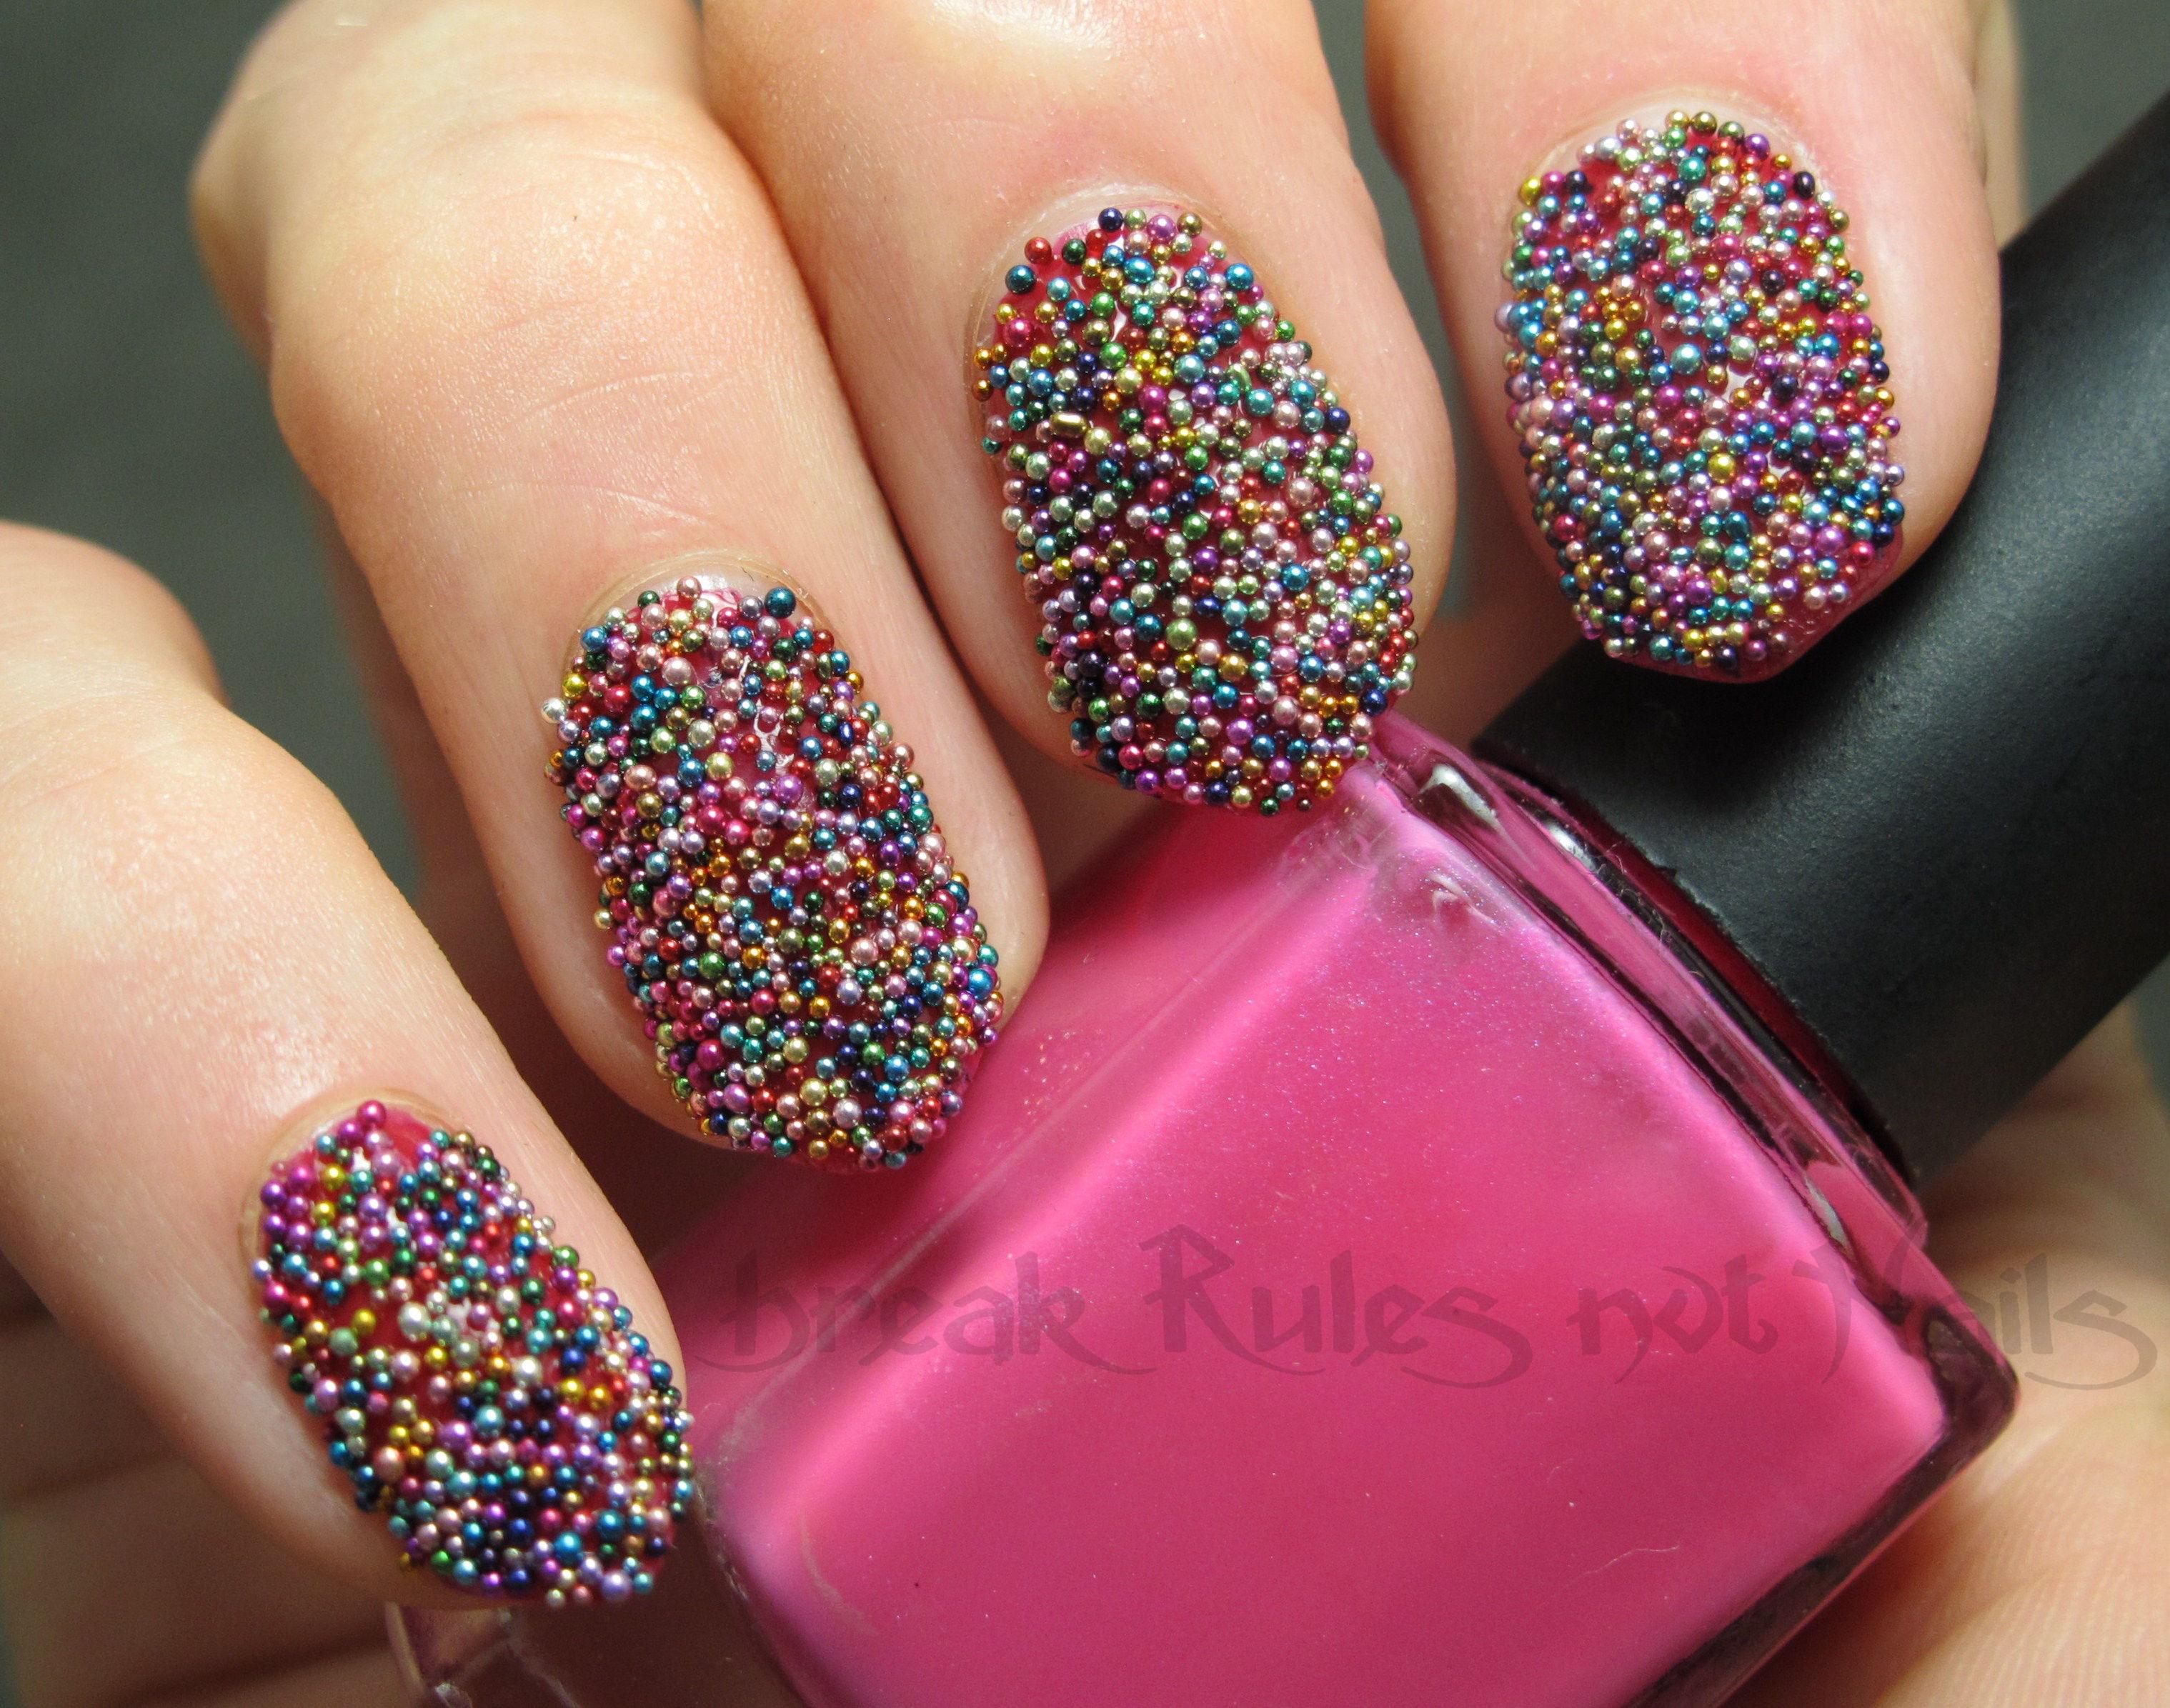 fairy bread nail art | Break rules, not nails